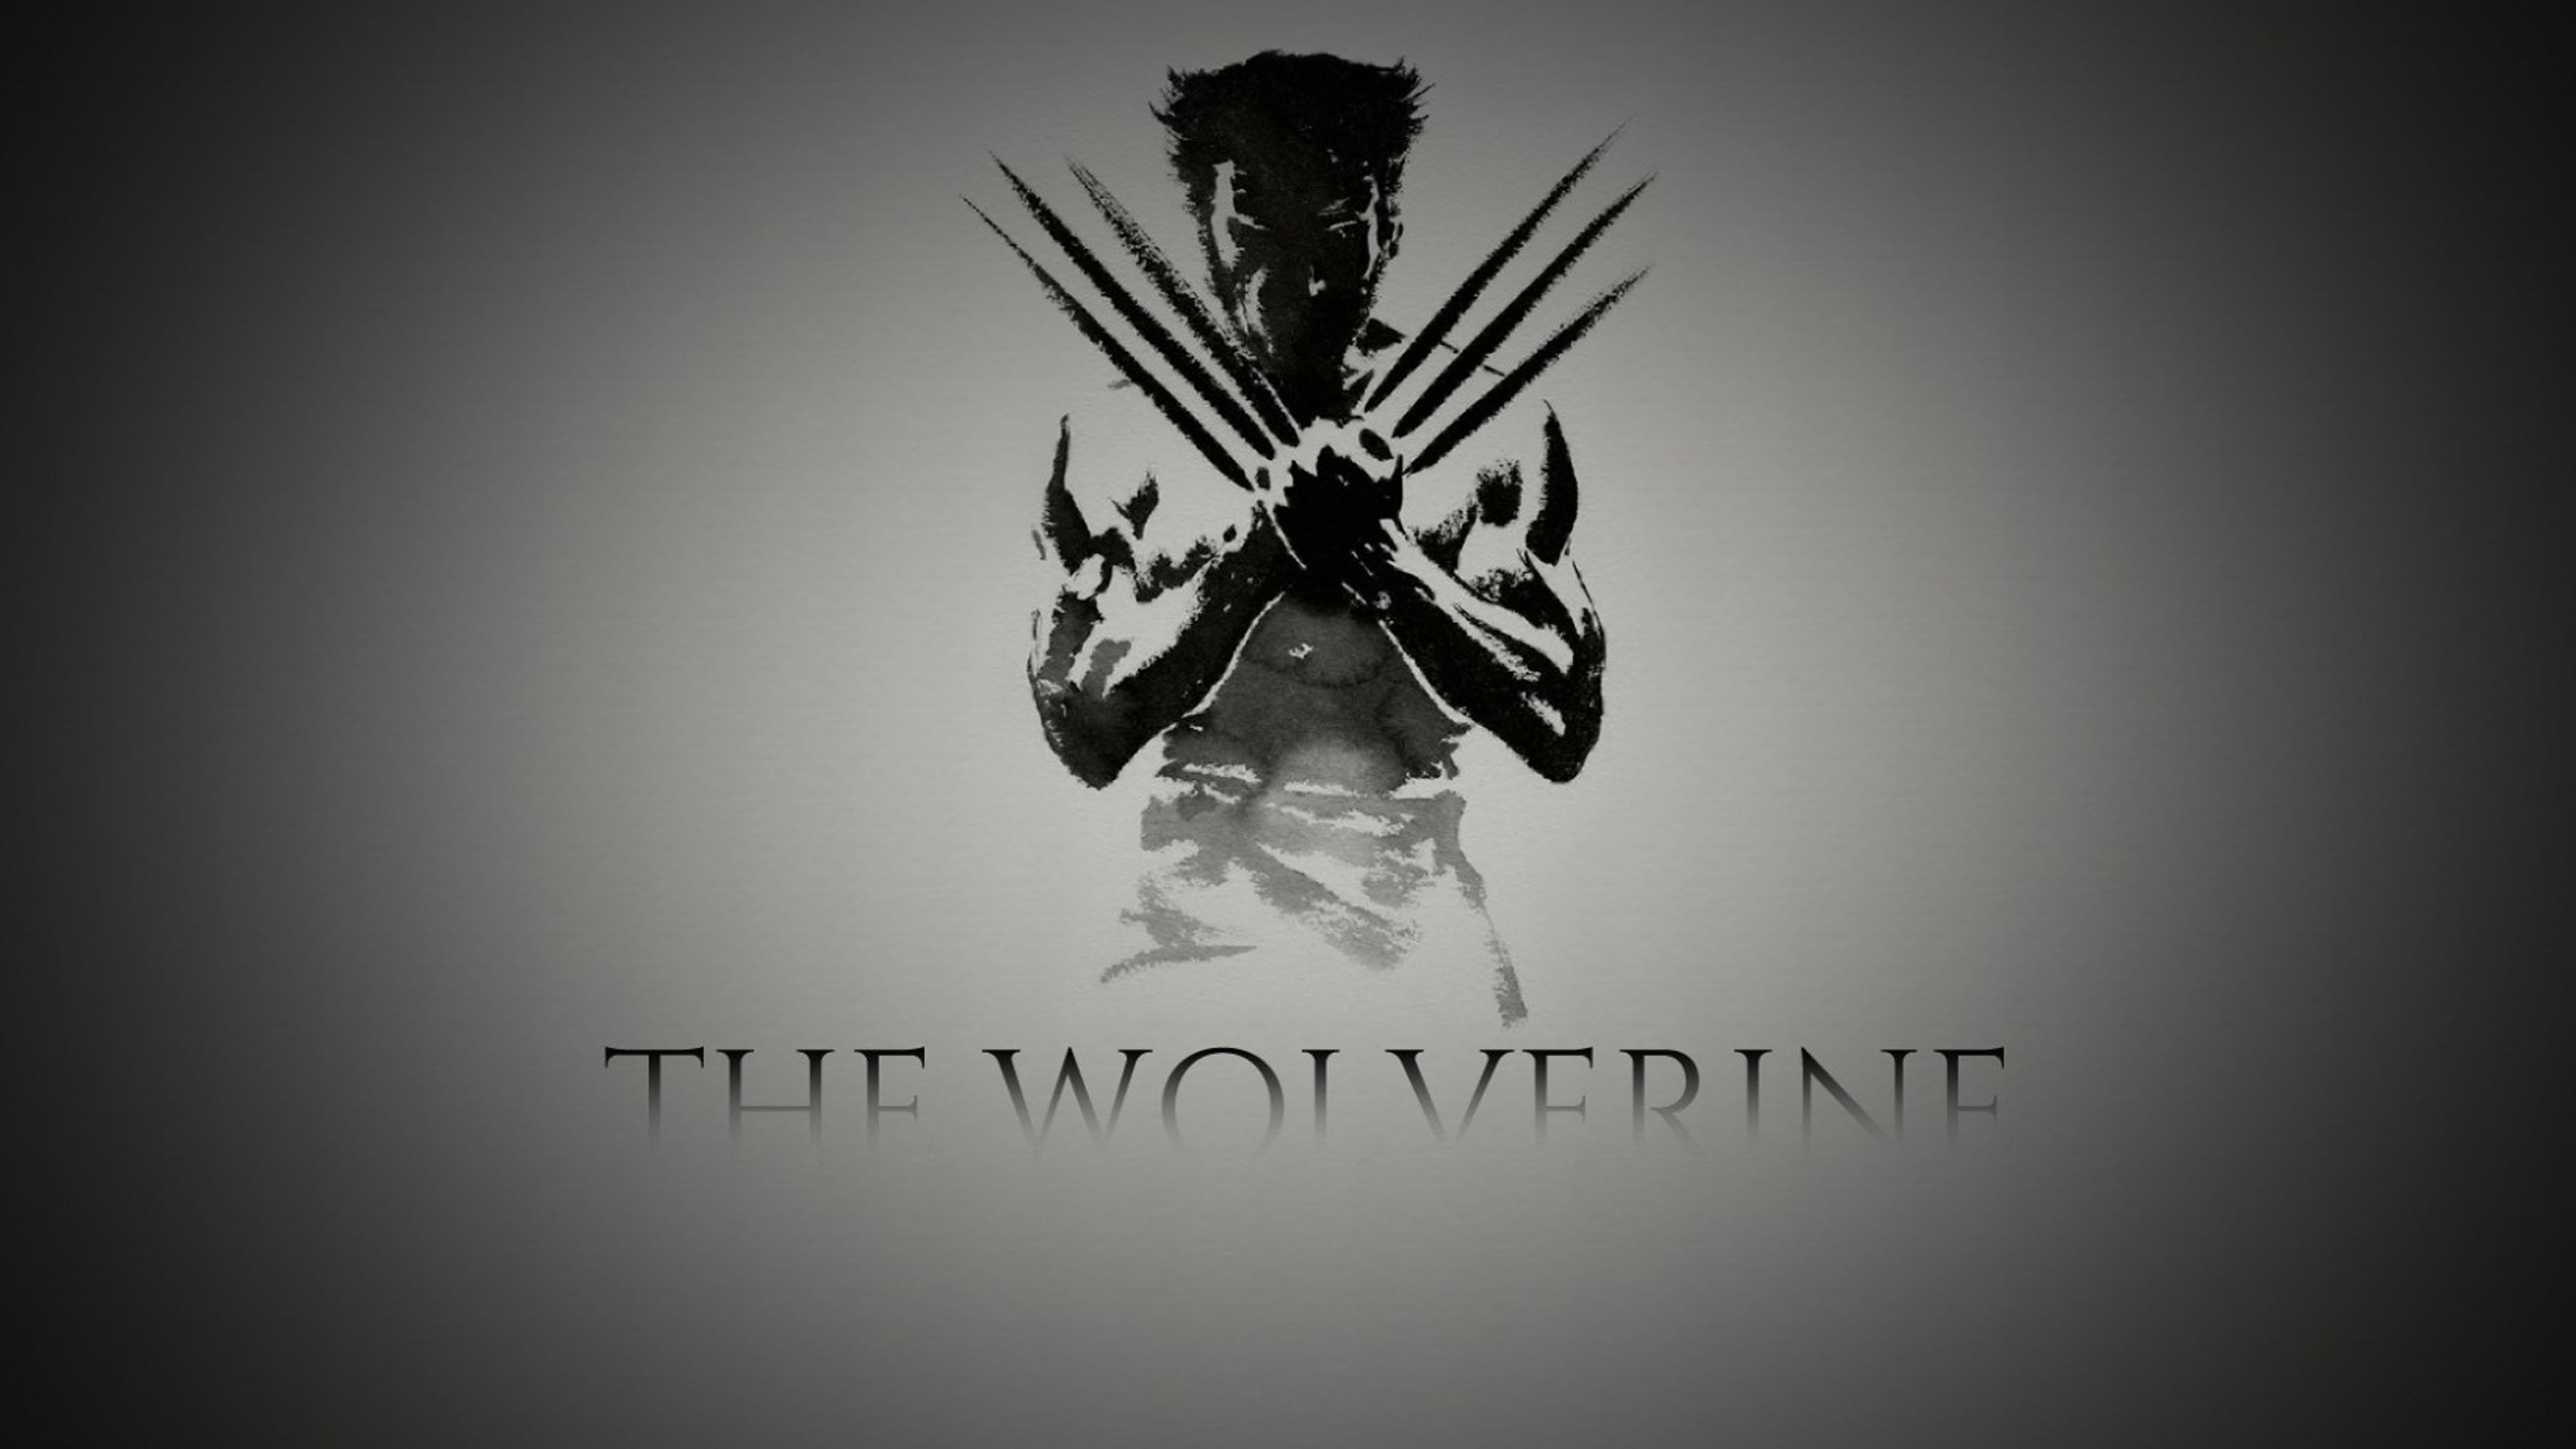 The Wolverine Wallpaper 3840x2160